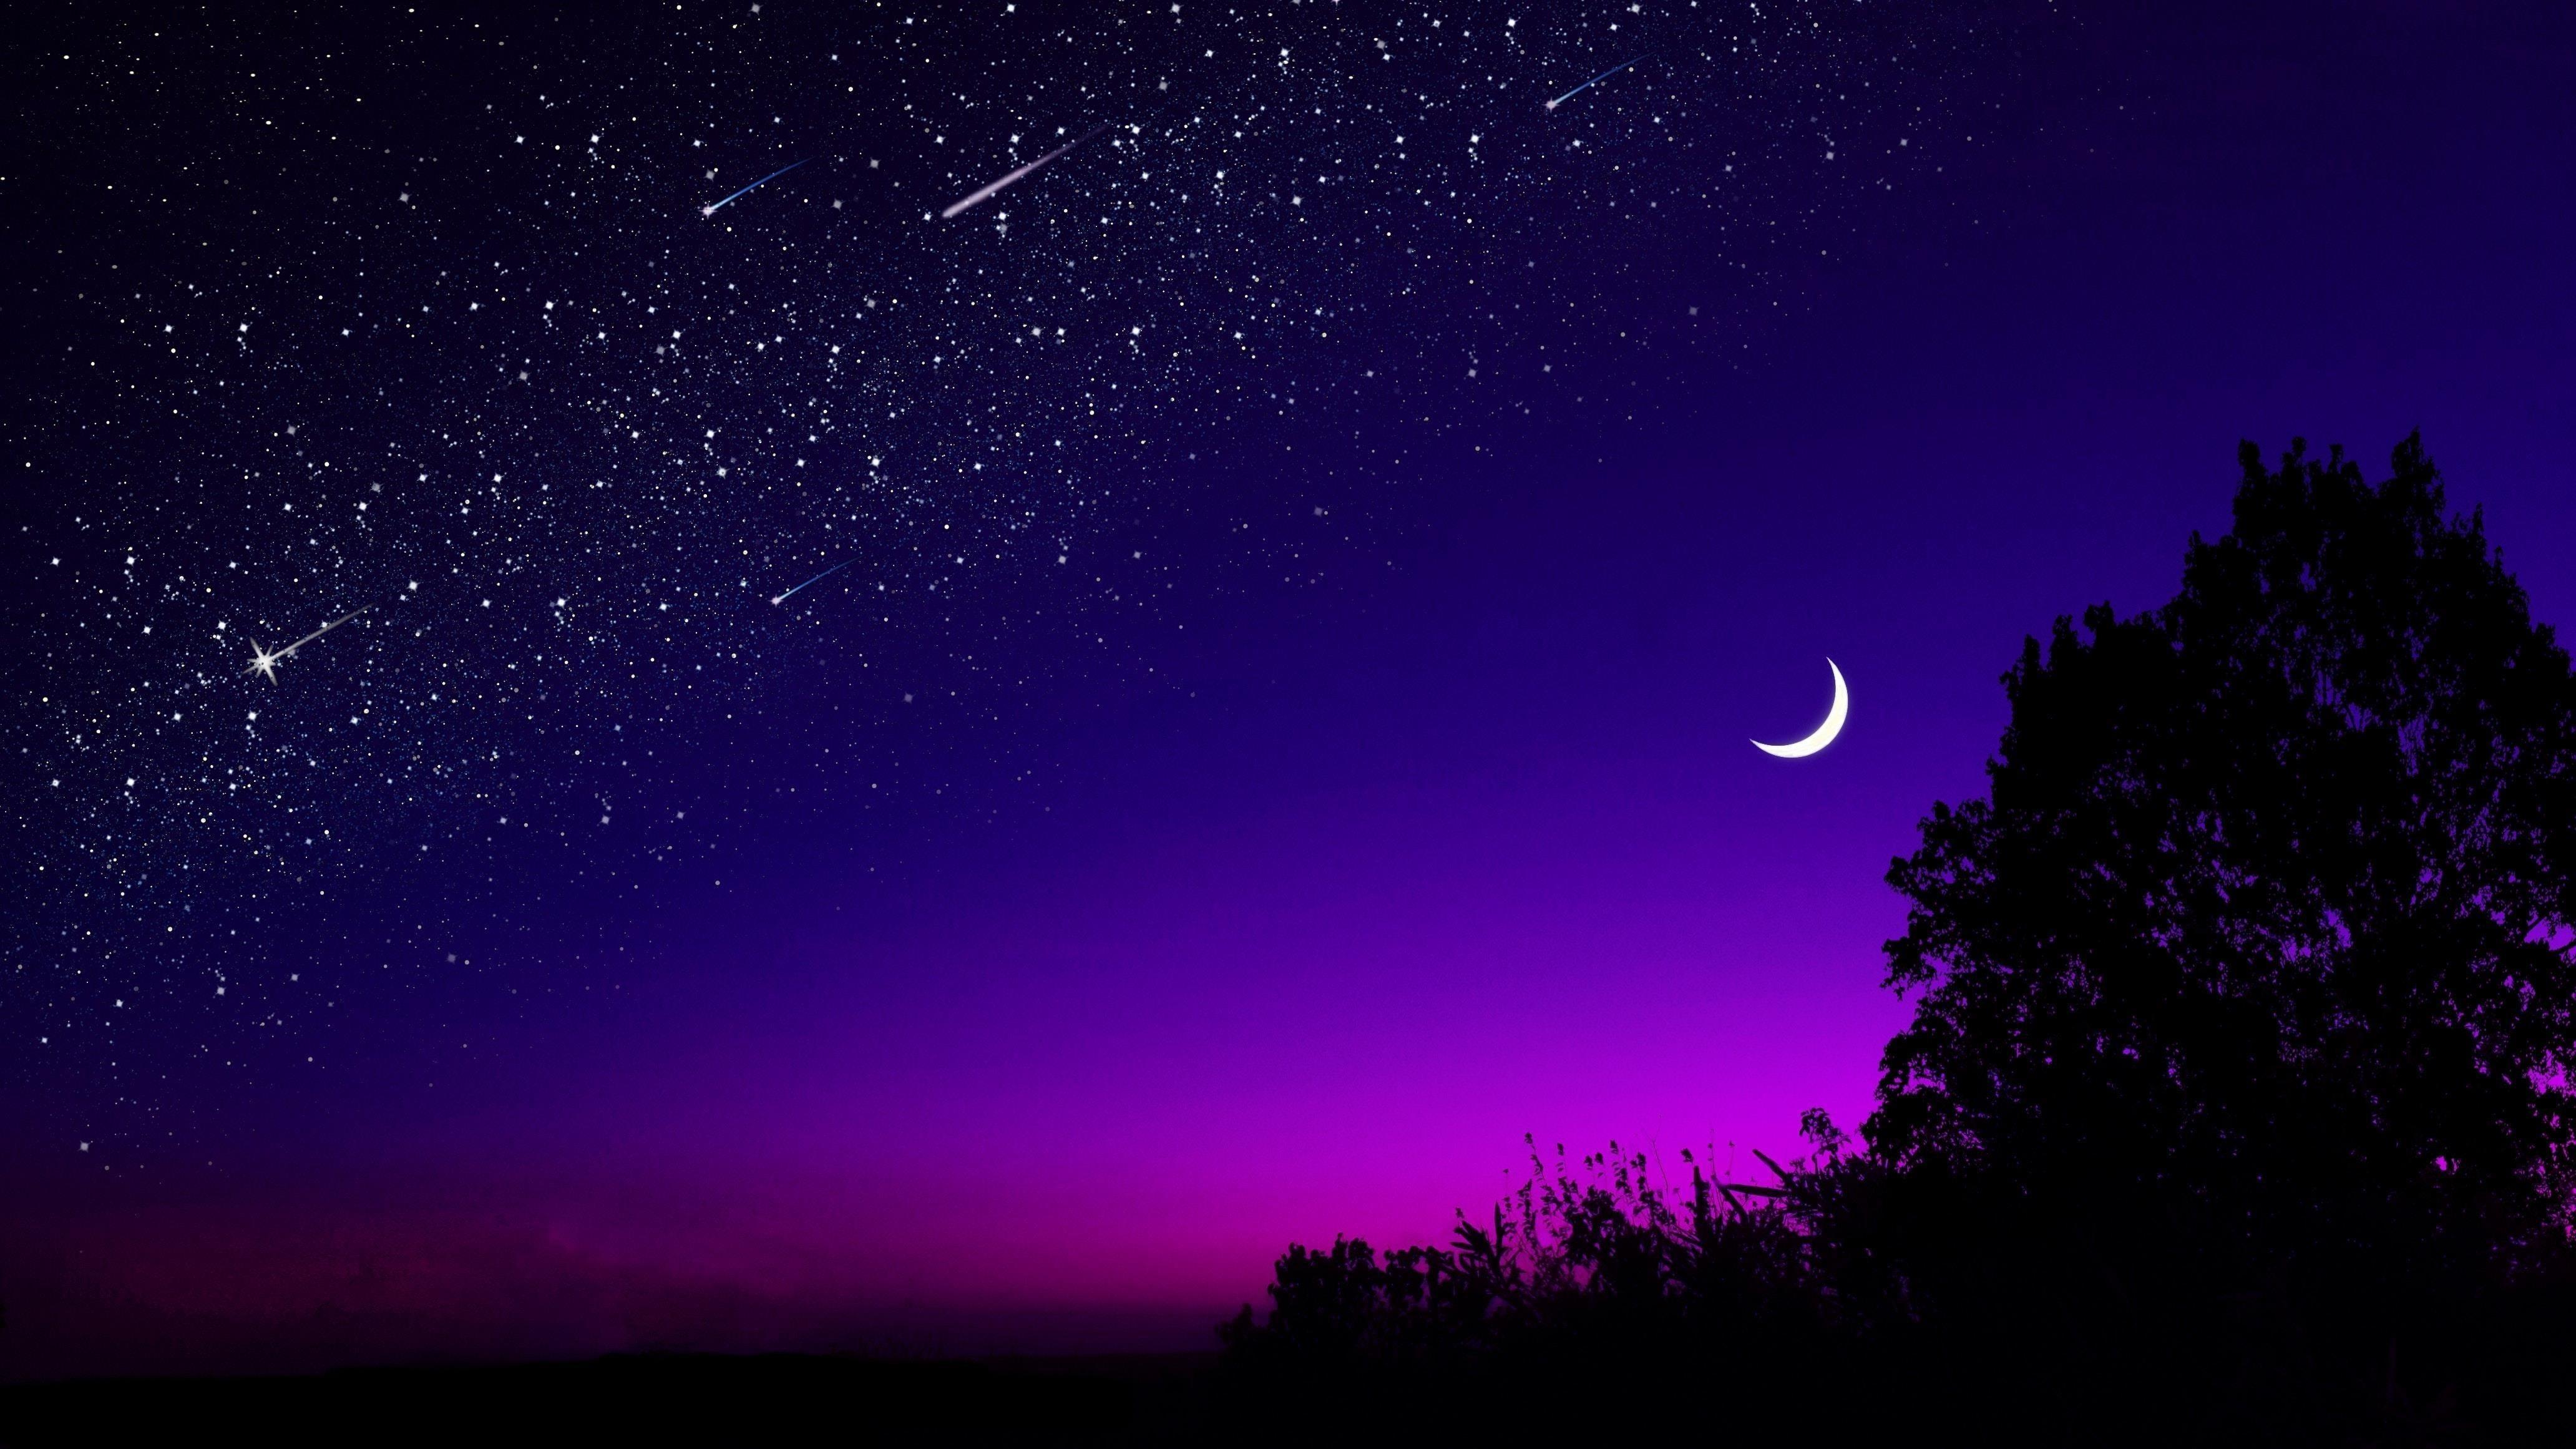 Blue starry sky half moon scene обои скачать